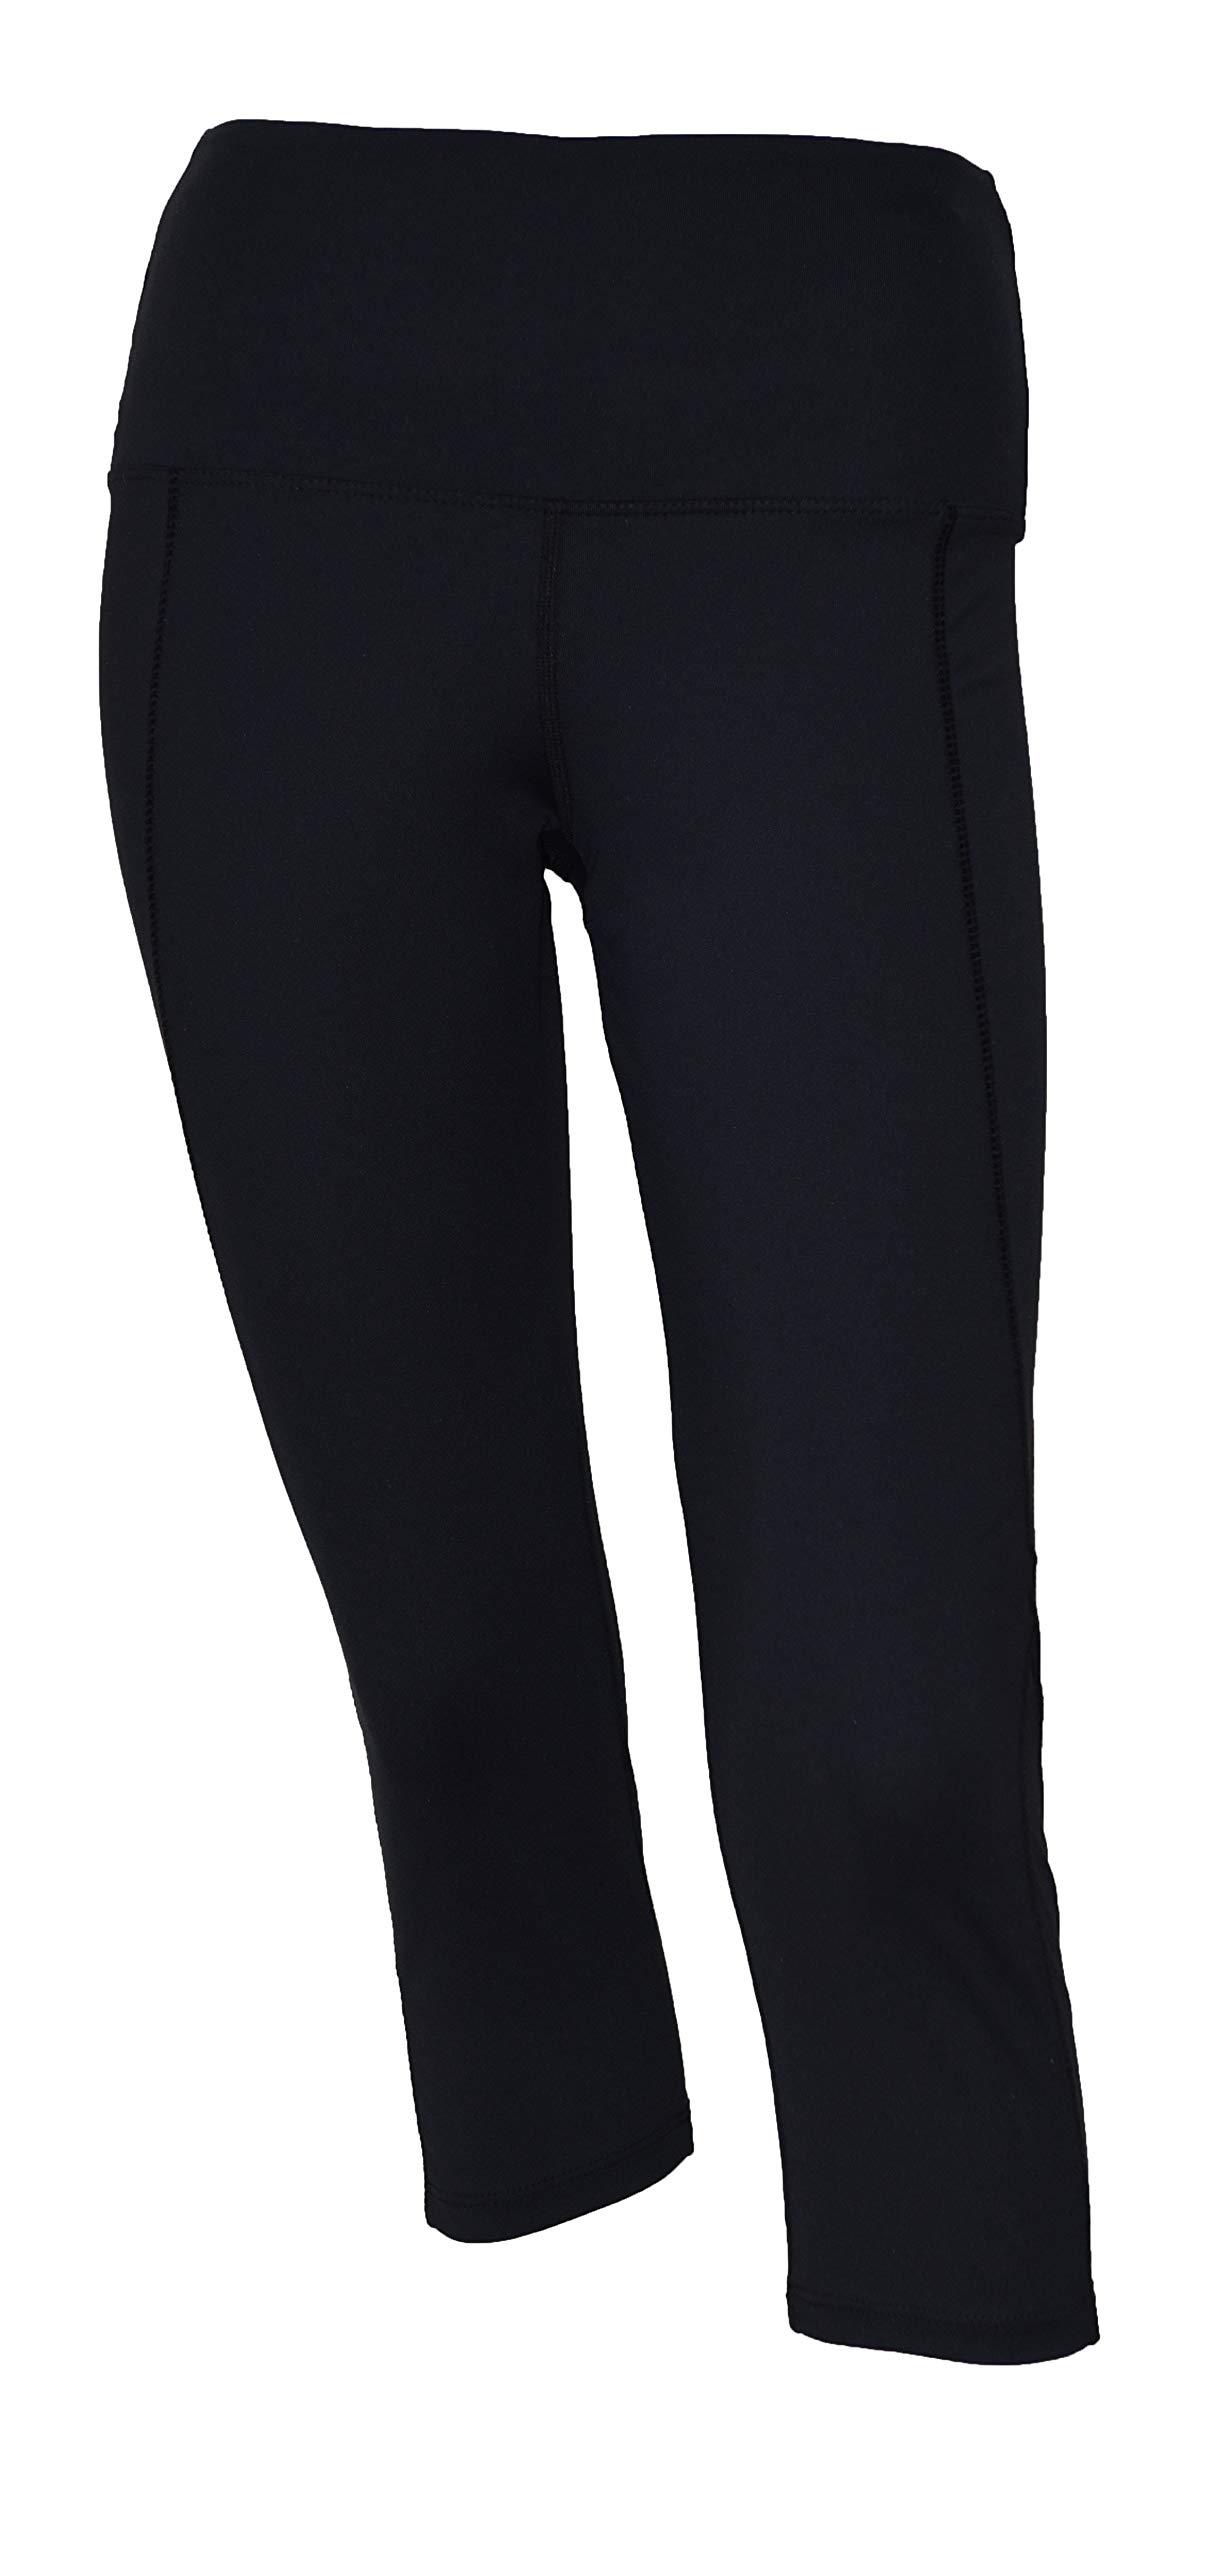 Private Island Women UV Swim Rash Guard Capri Pocket Pants Yoga (XL, Black) by Private Island